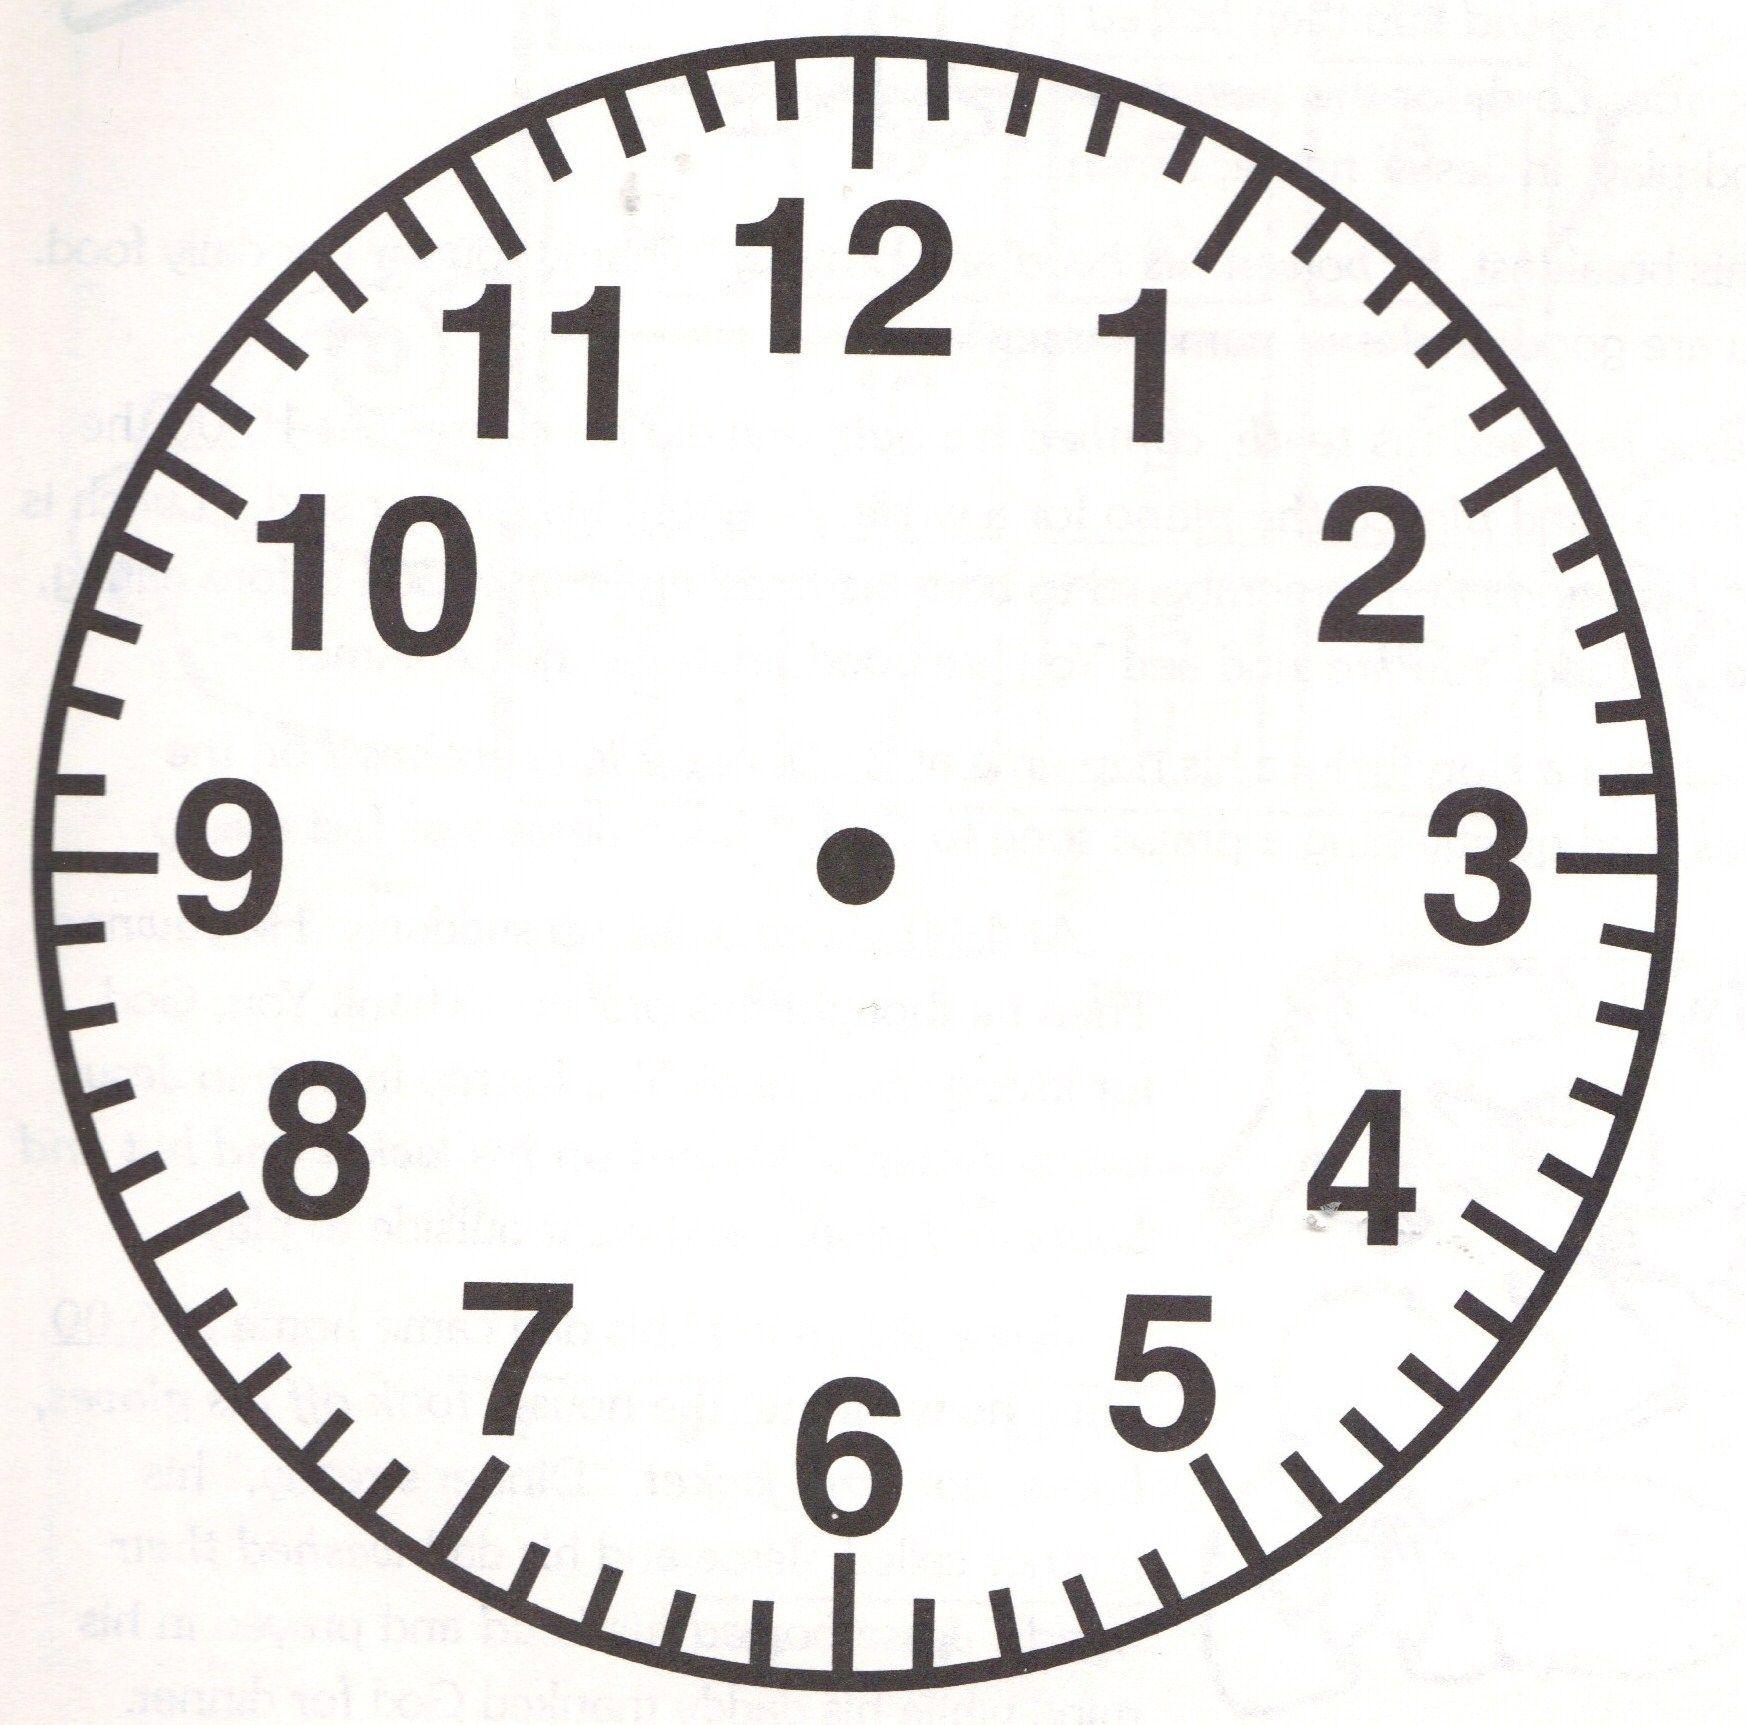 Image result for analog clock face | Education JP | Clock